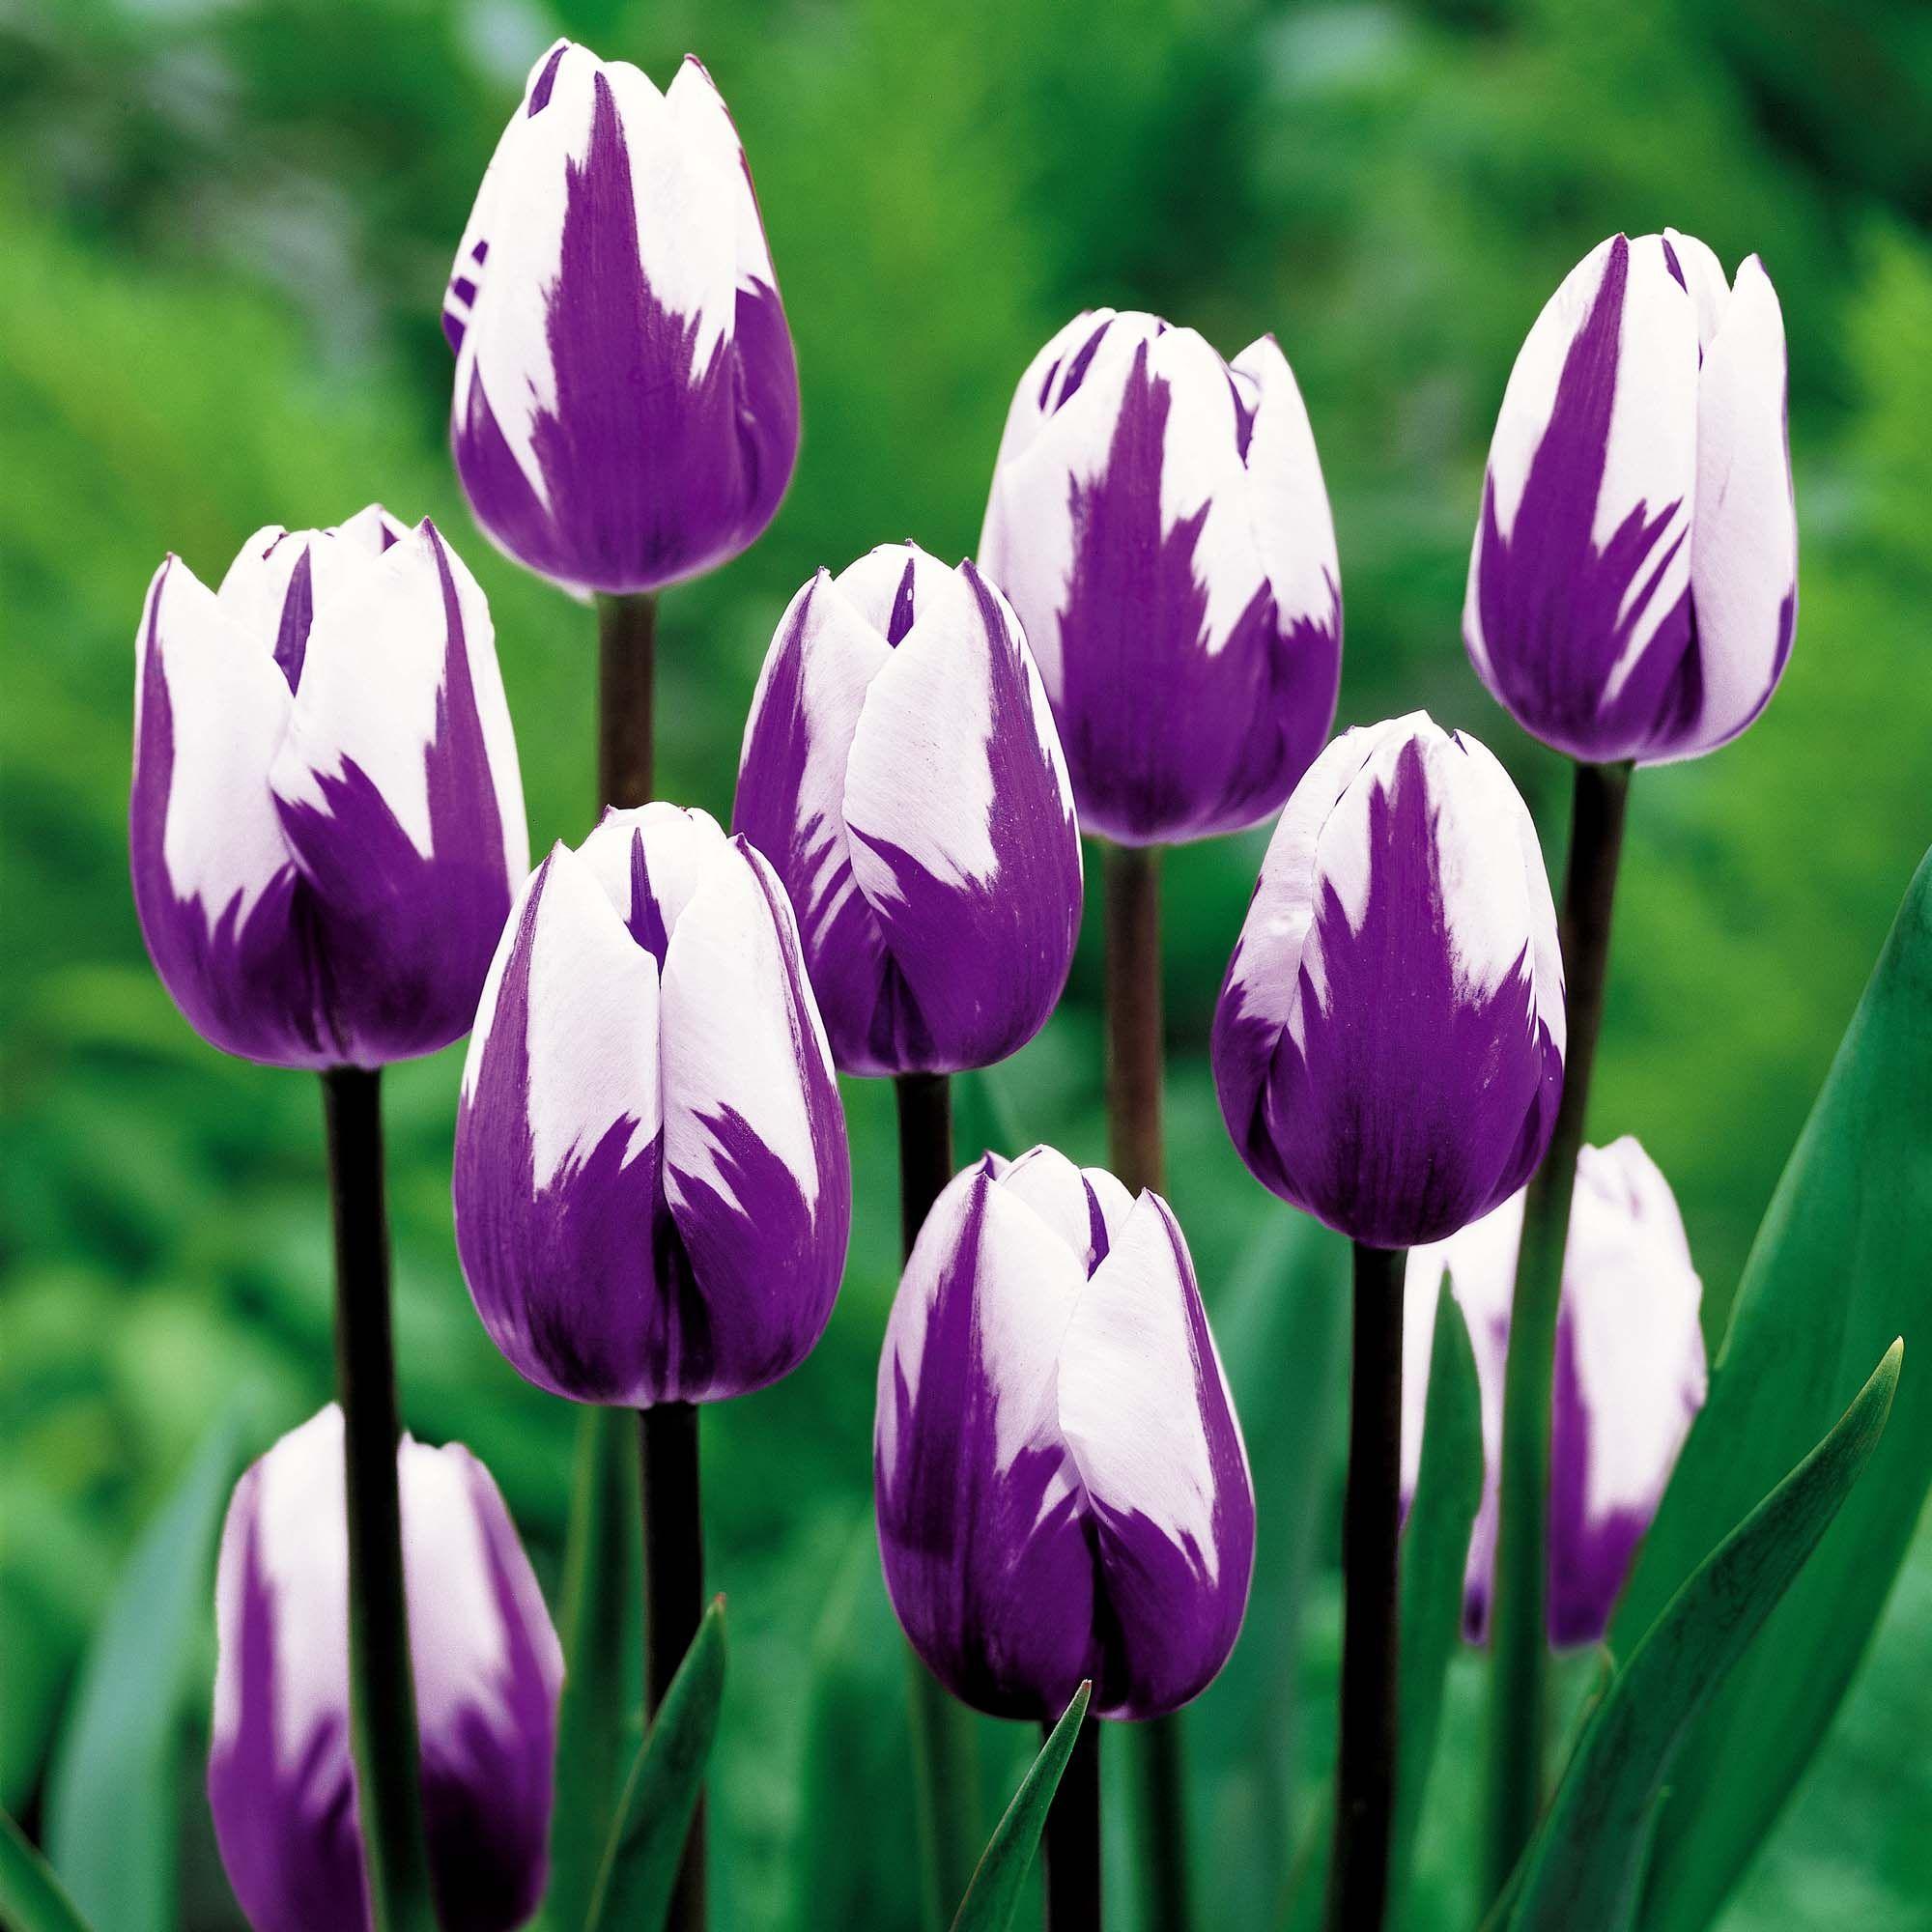 Tulip Tulip Purple Tulip Flower Wide Screen 3d Hd High Resolution Wallpaper Bulb Flowers Tulips Flowers Tulip Seeds